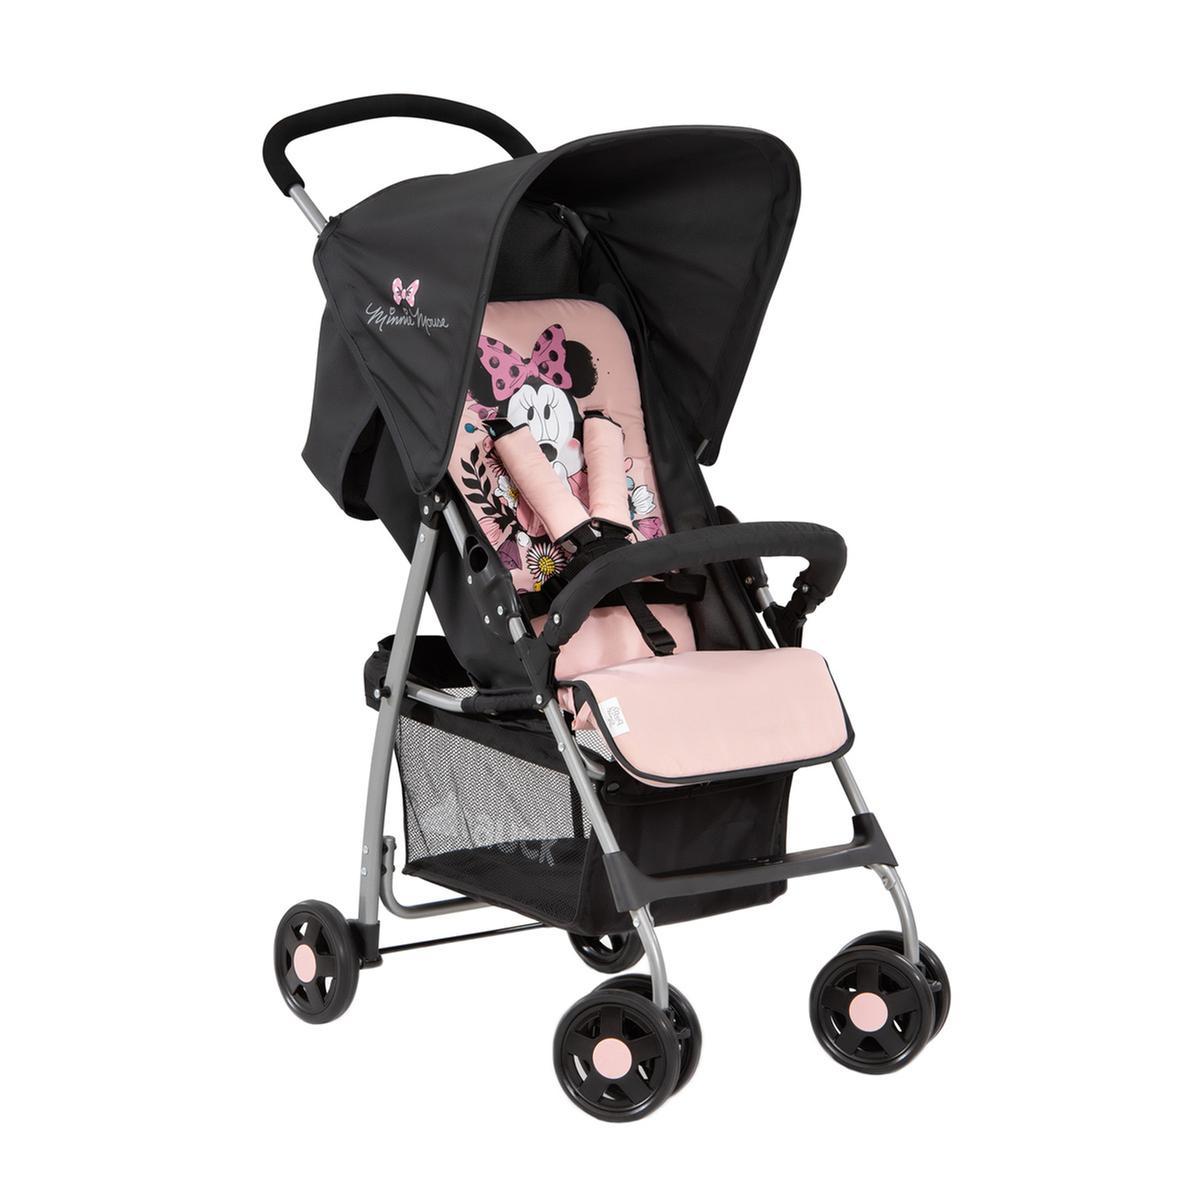 silla de paseo bebe minnie mouse